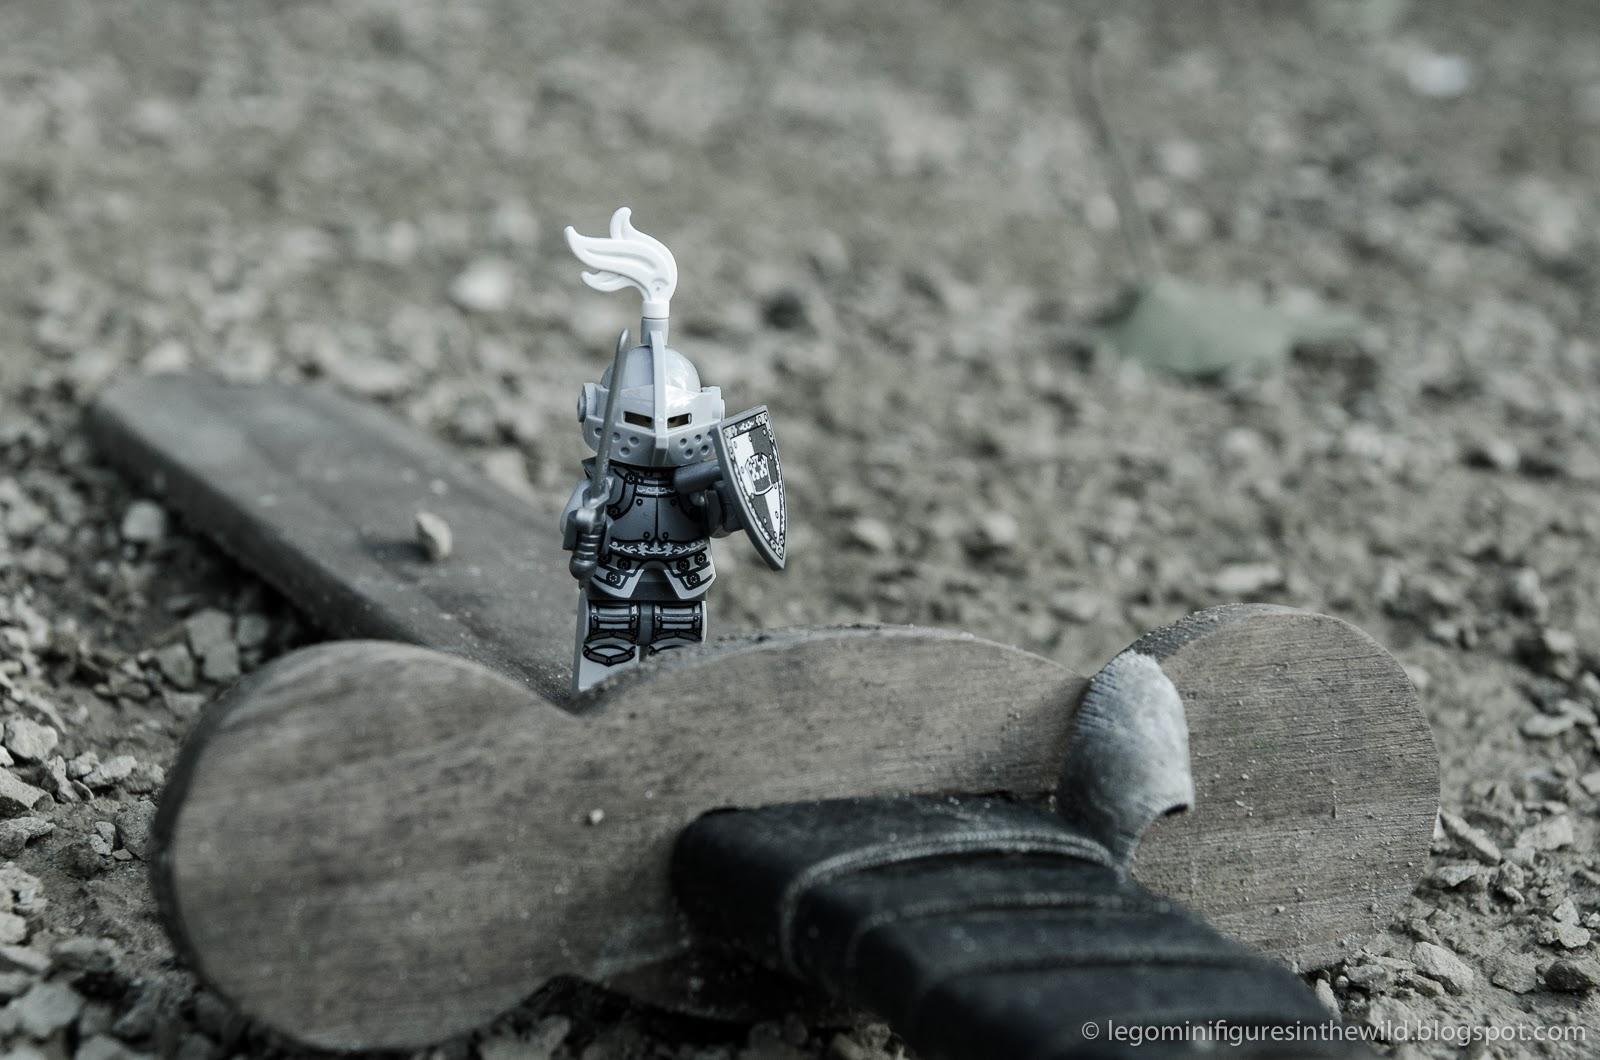 Lego Minifigure Series 9 Knight